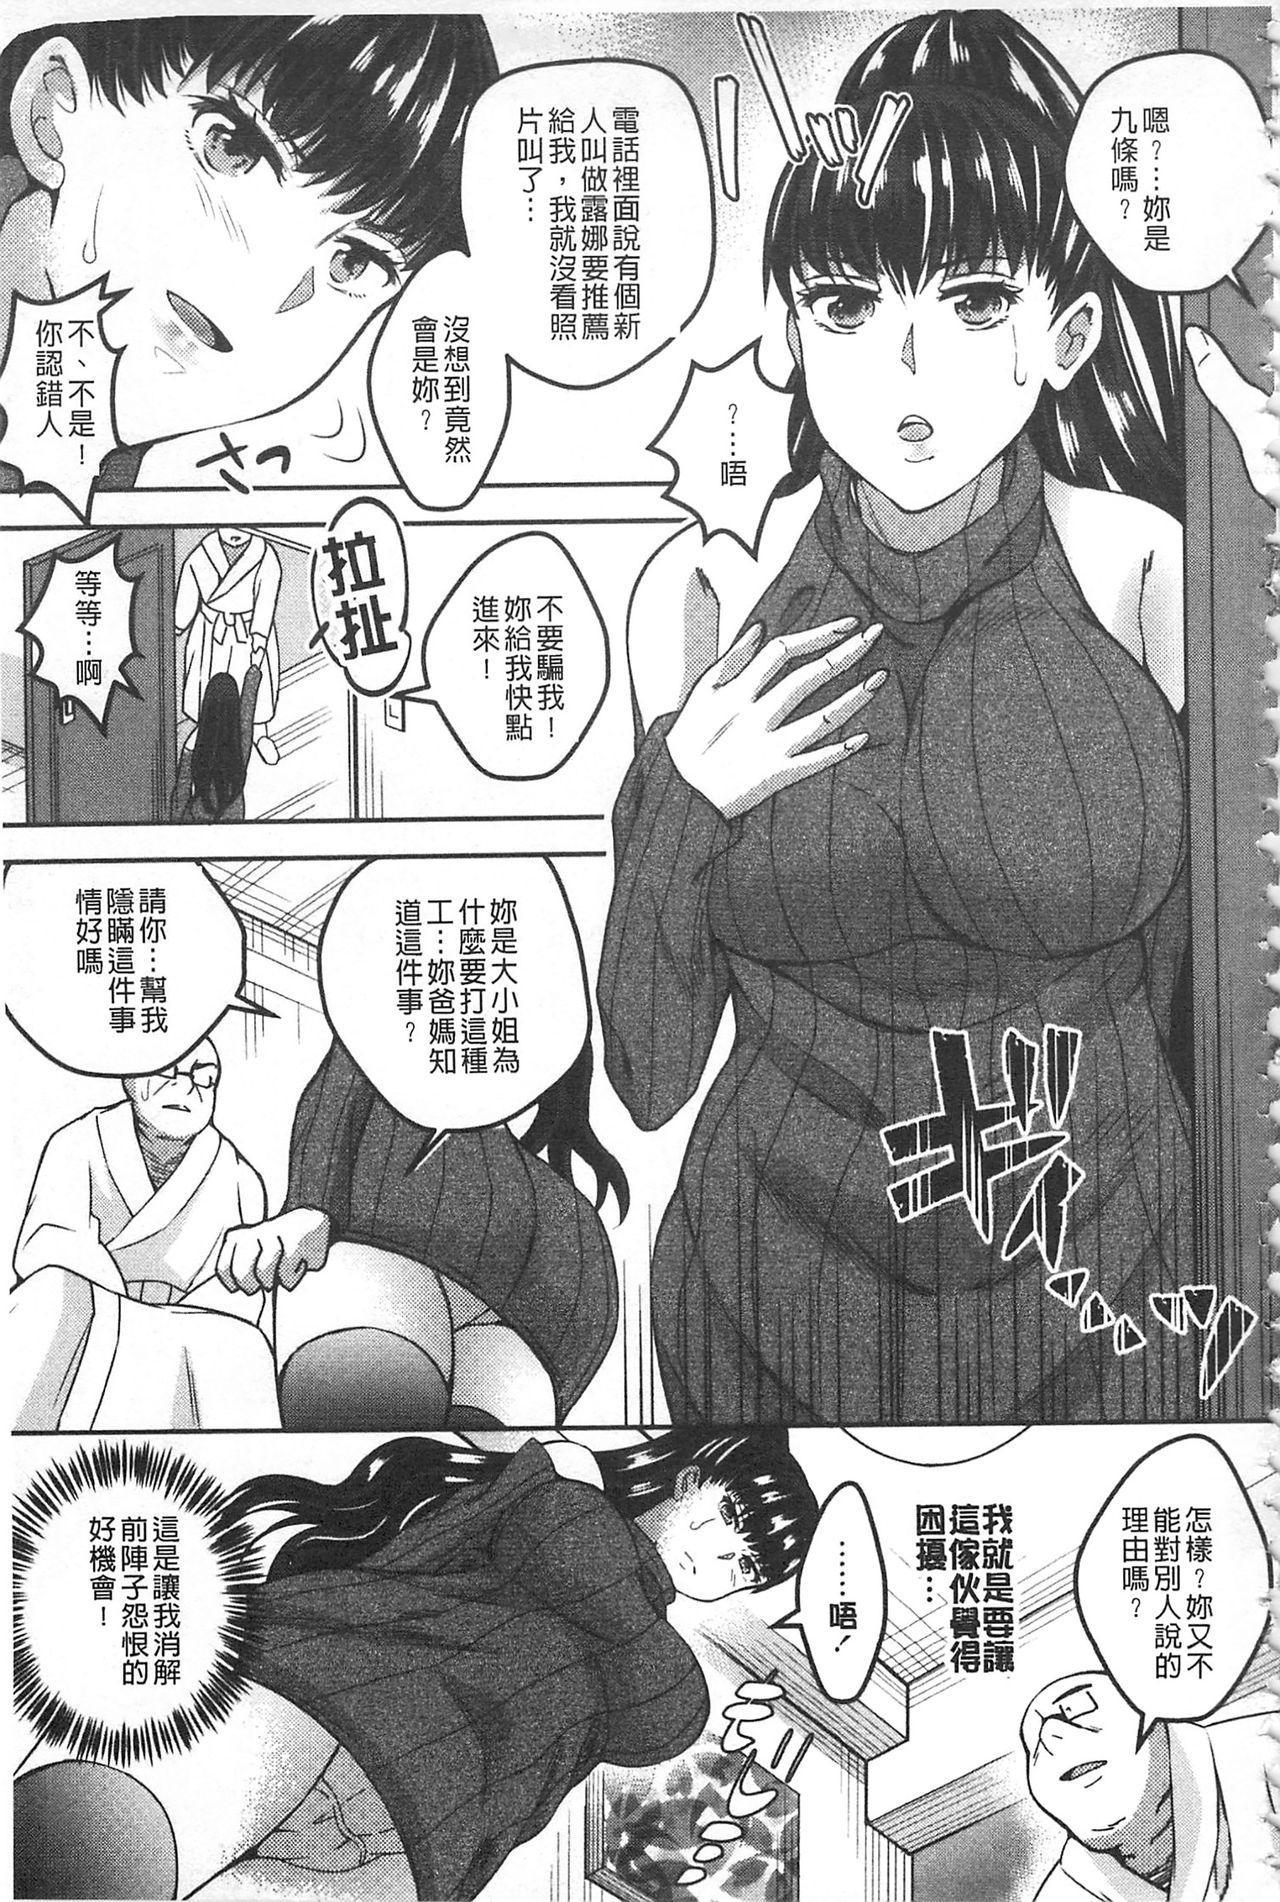 Kanjuku Otome no Odoshikata | 姦熟乙女的脅迫法 48